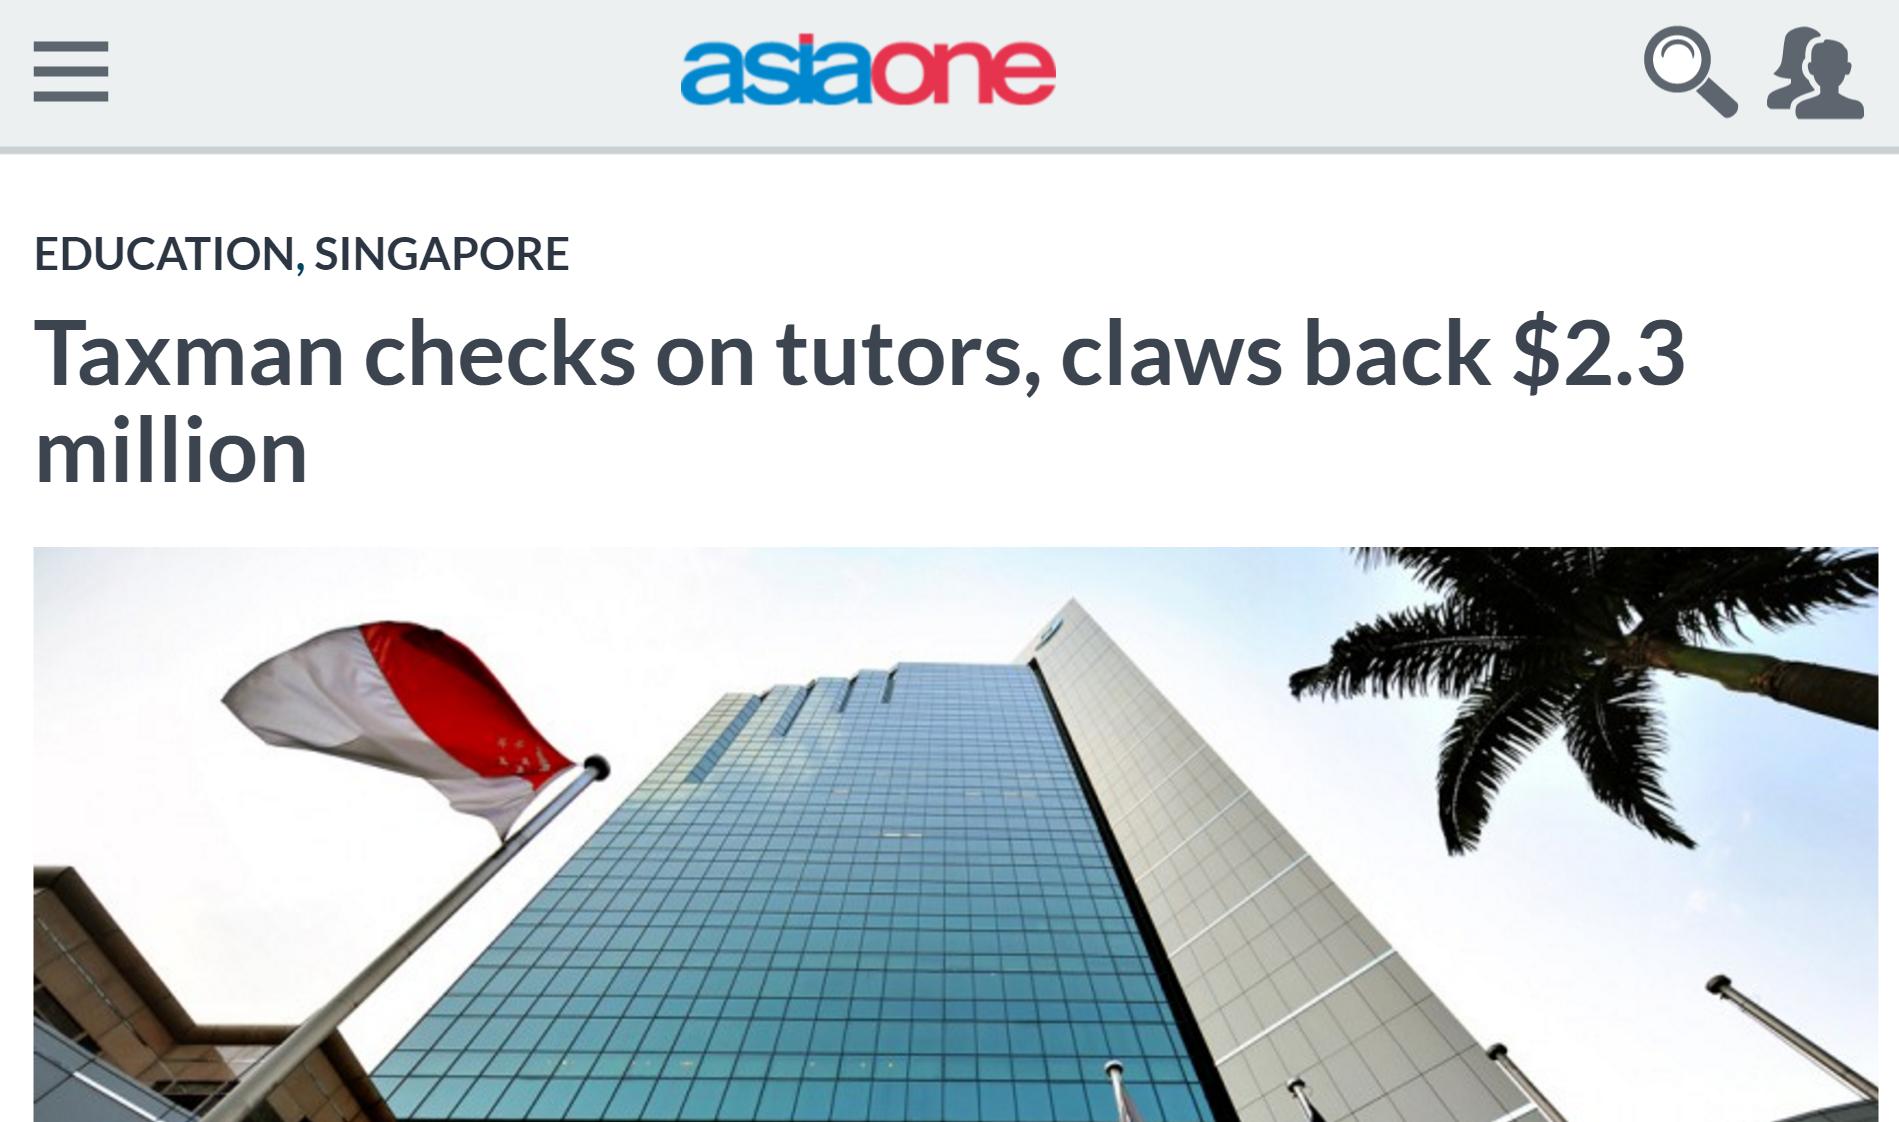 Taxman checks on tutors, claws back $2.3 million